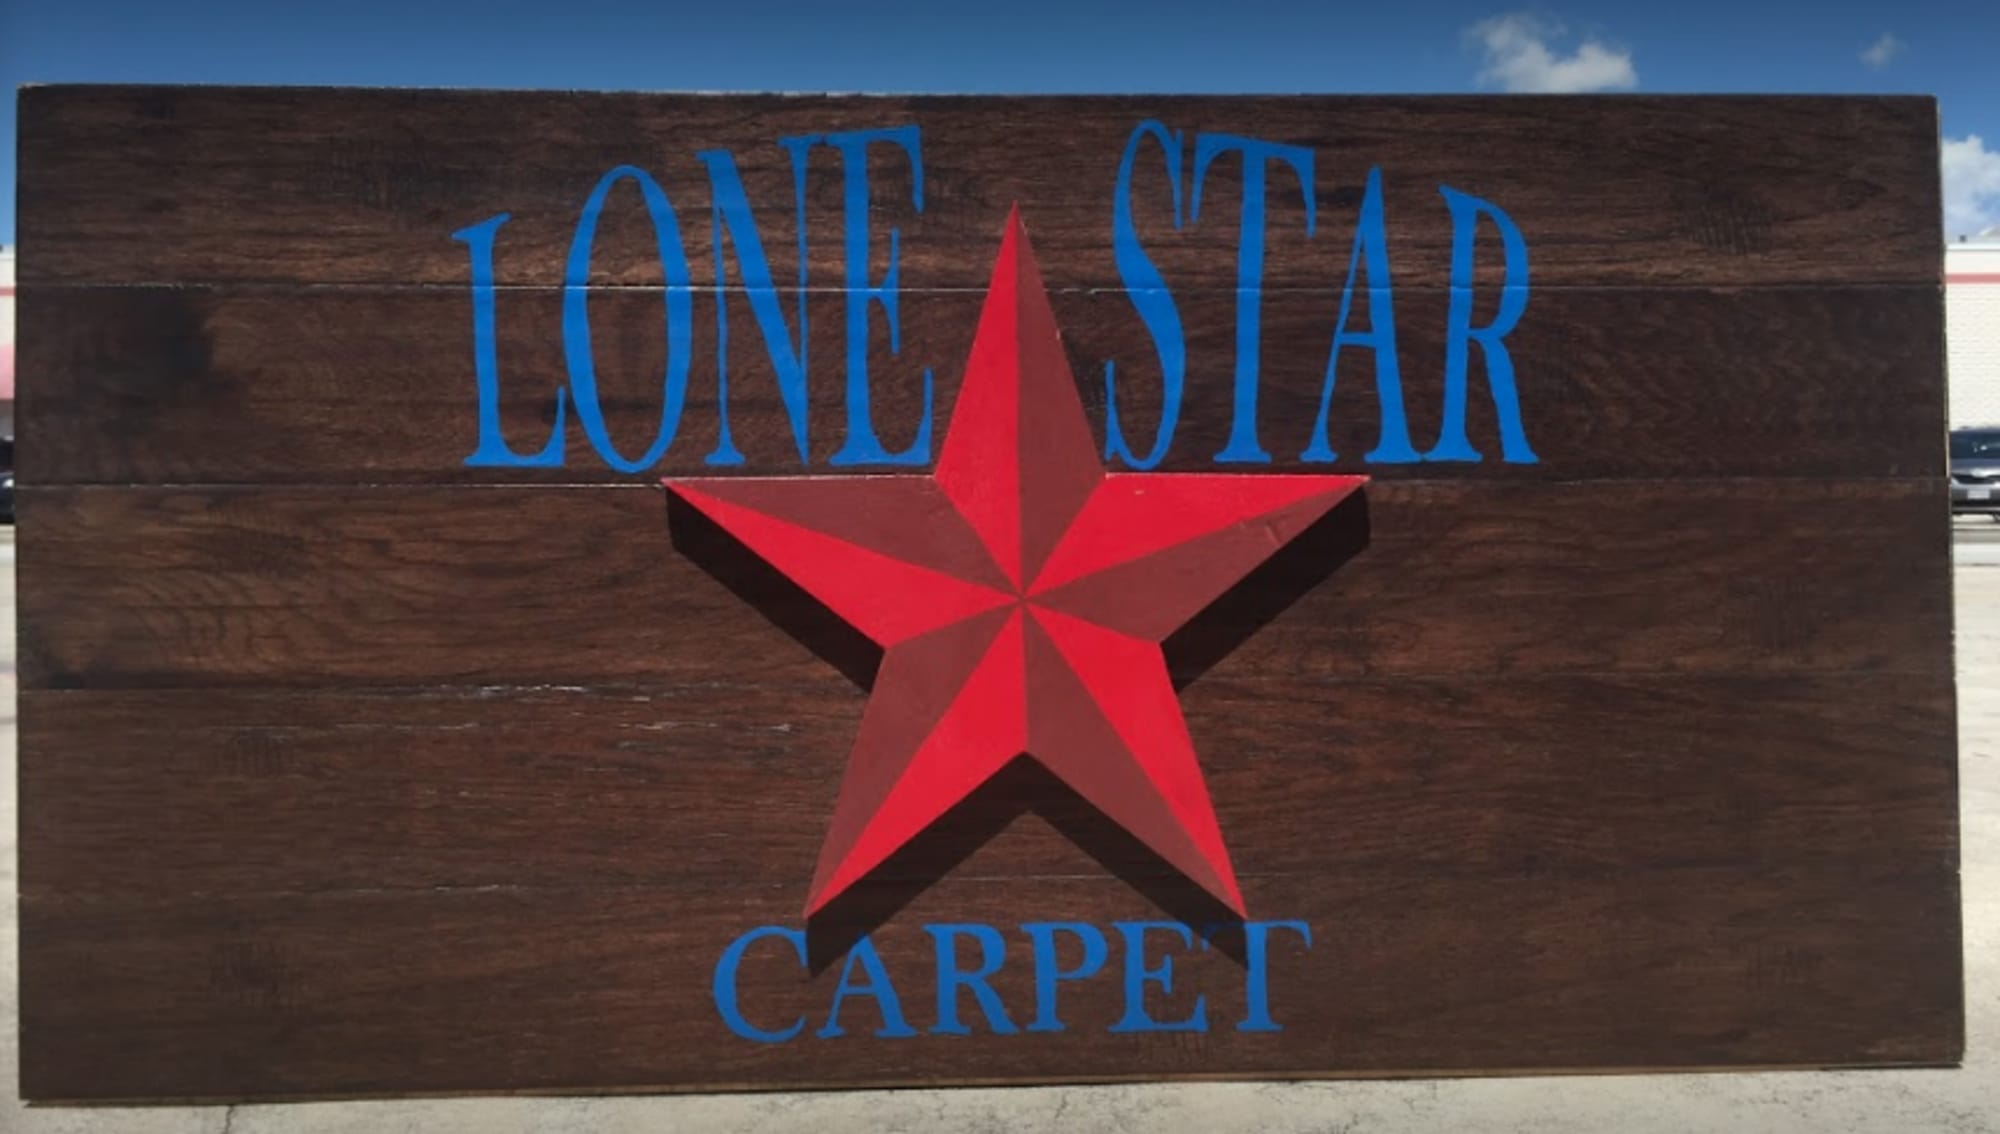 Lonestar Carpets - 5702 Business Park San Antonio, TX 78218